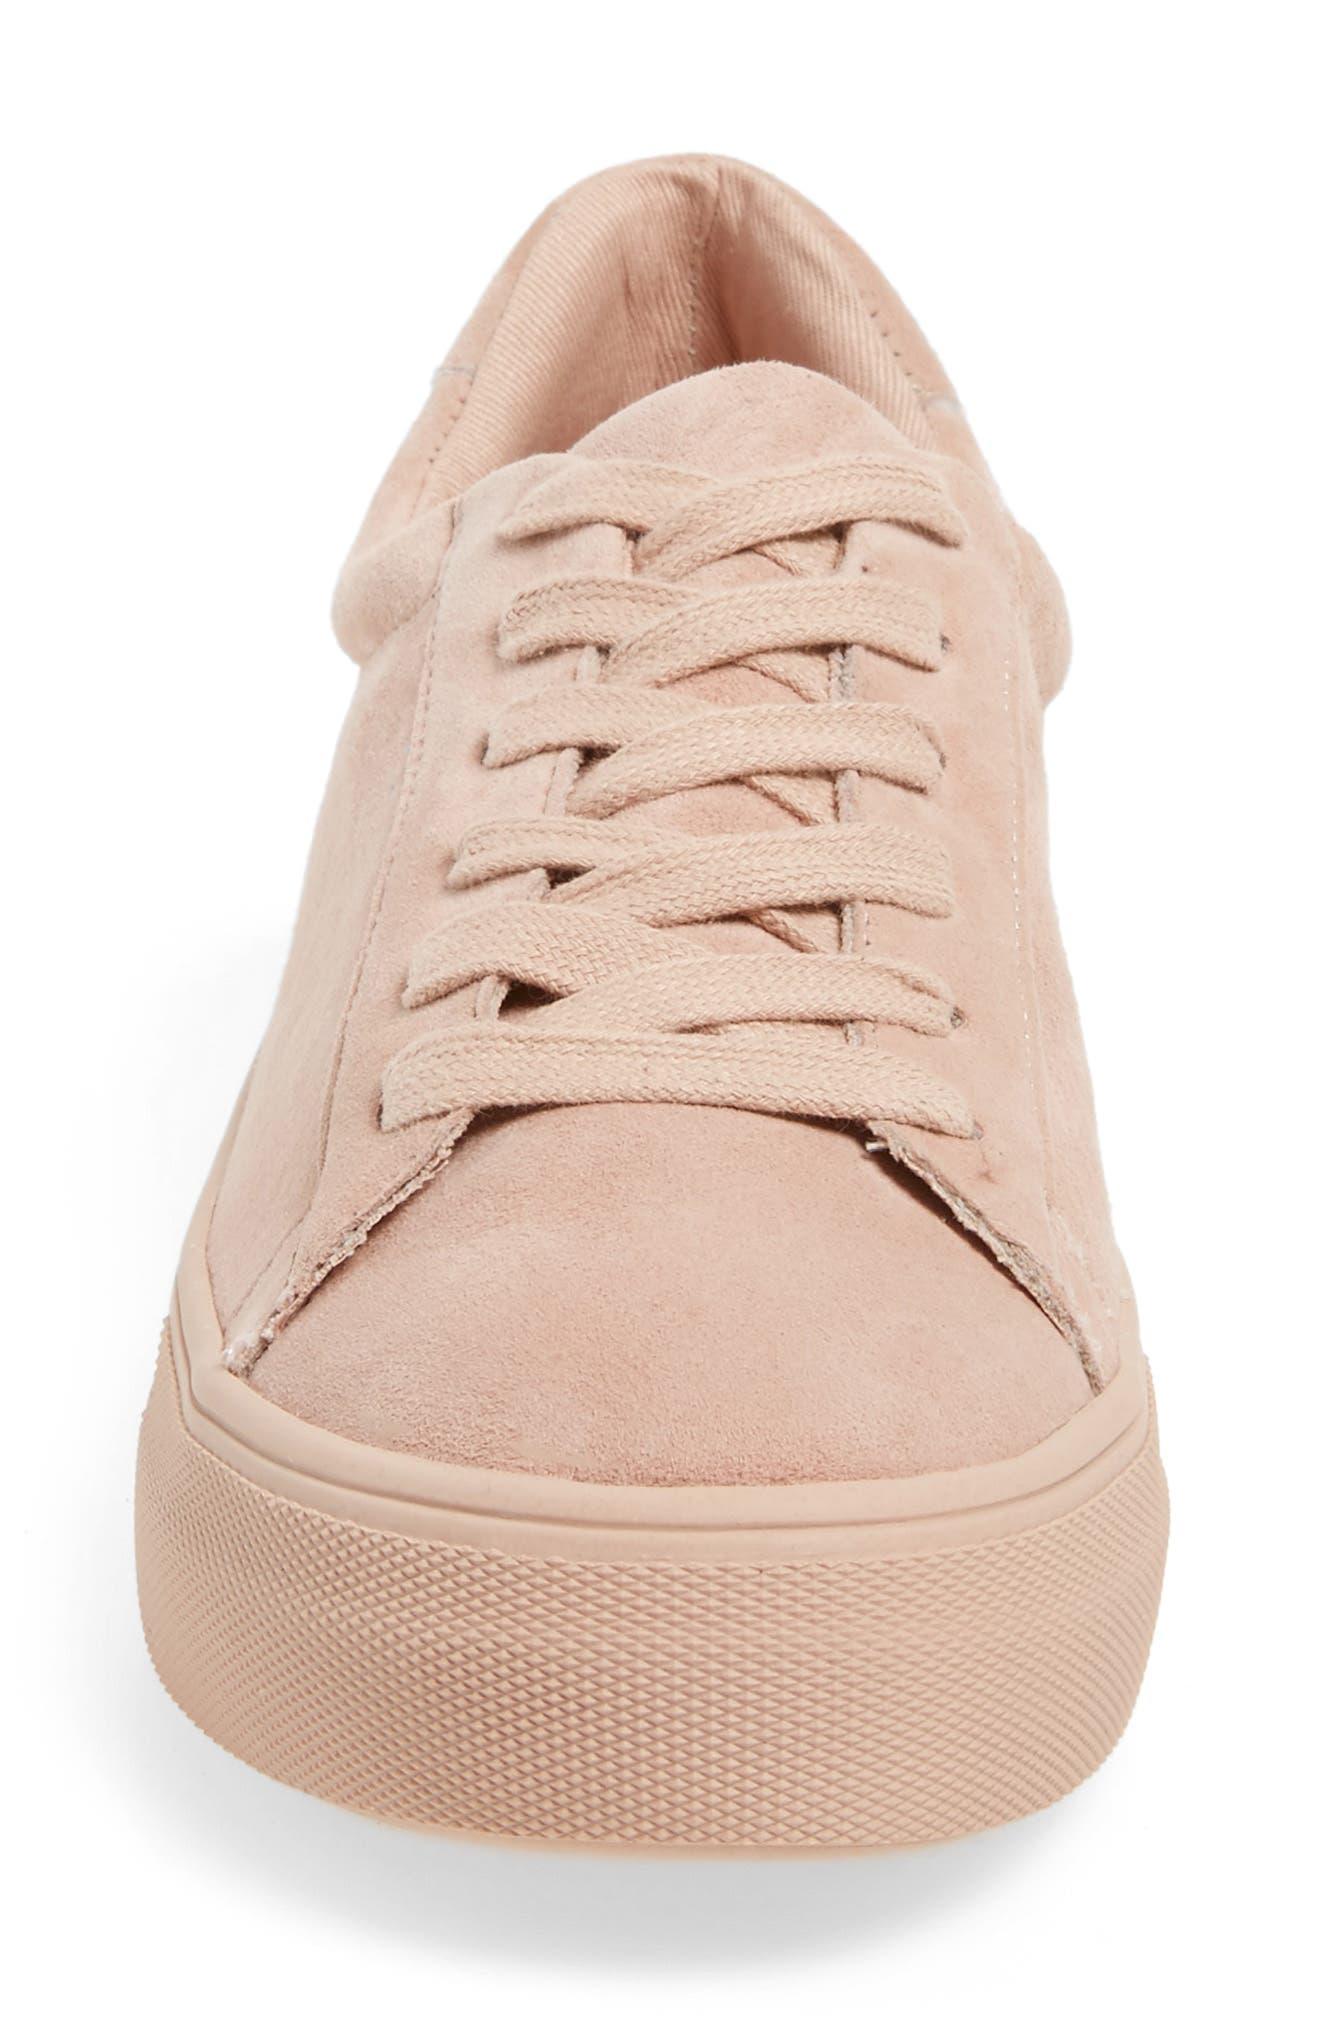 Gisela Low Top Sneaker,                             Alternate thumbnail 12, color,